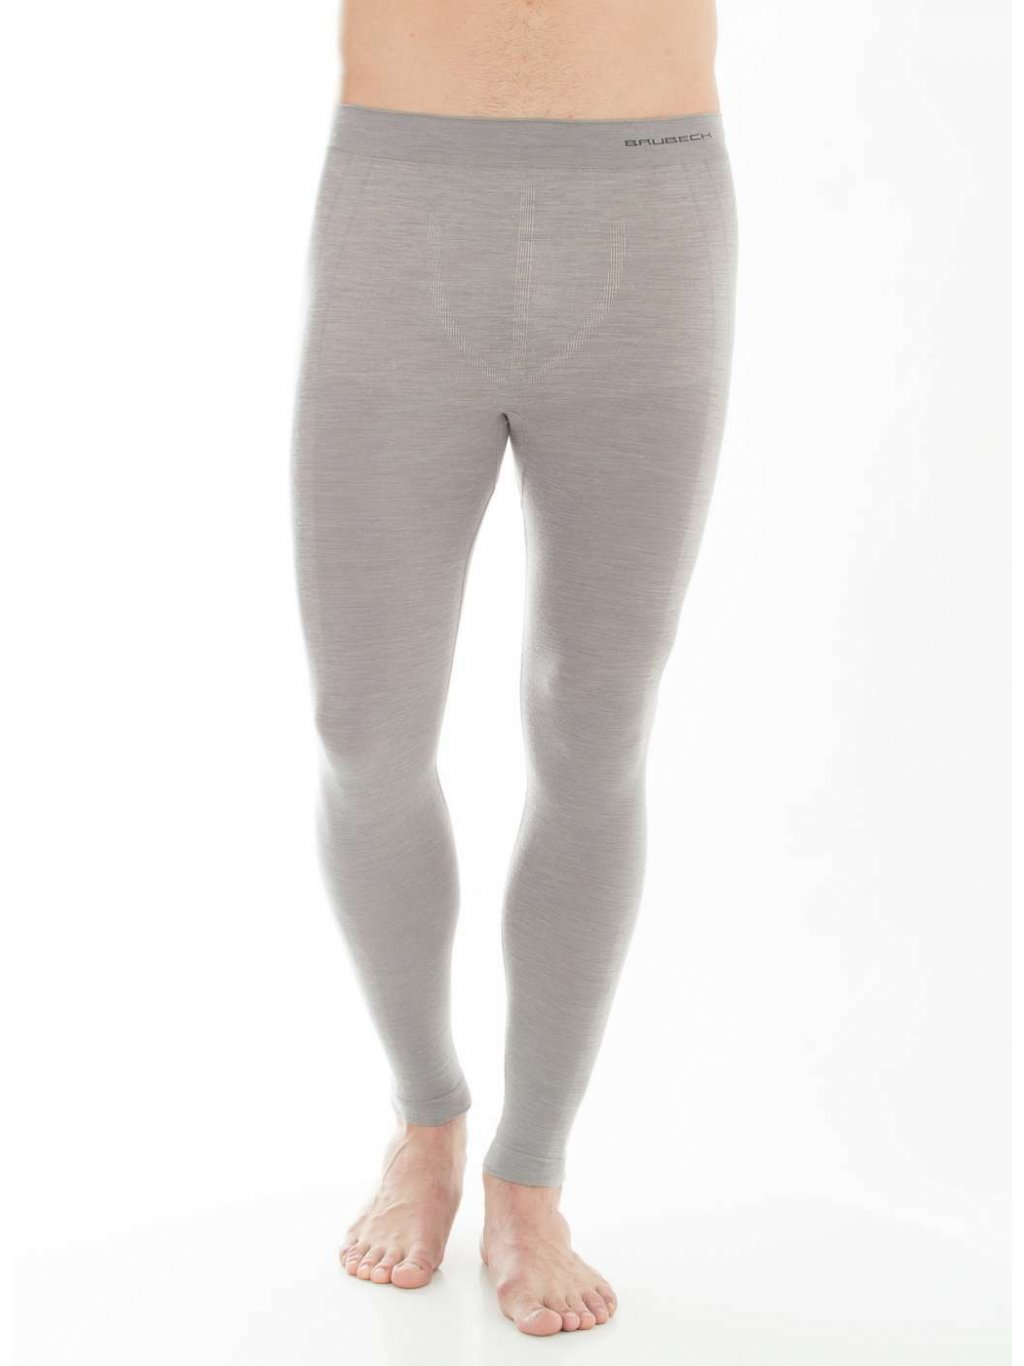 Brubeck pánské kalhoty Comfort wool